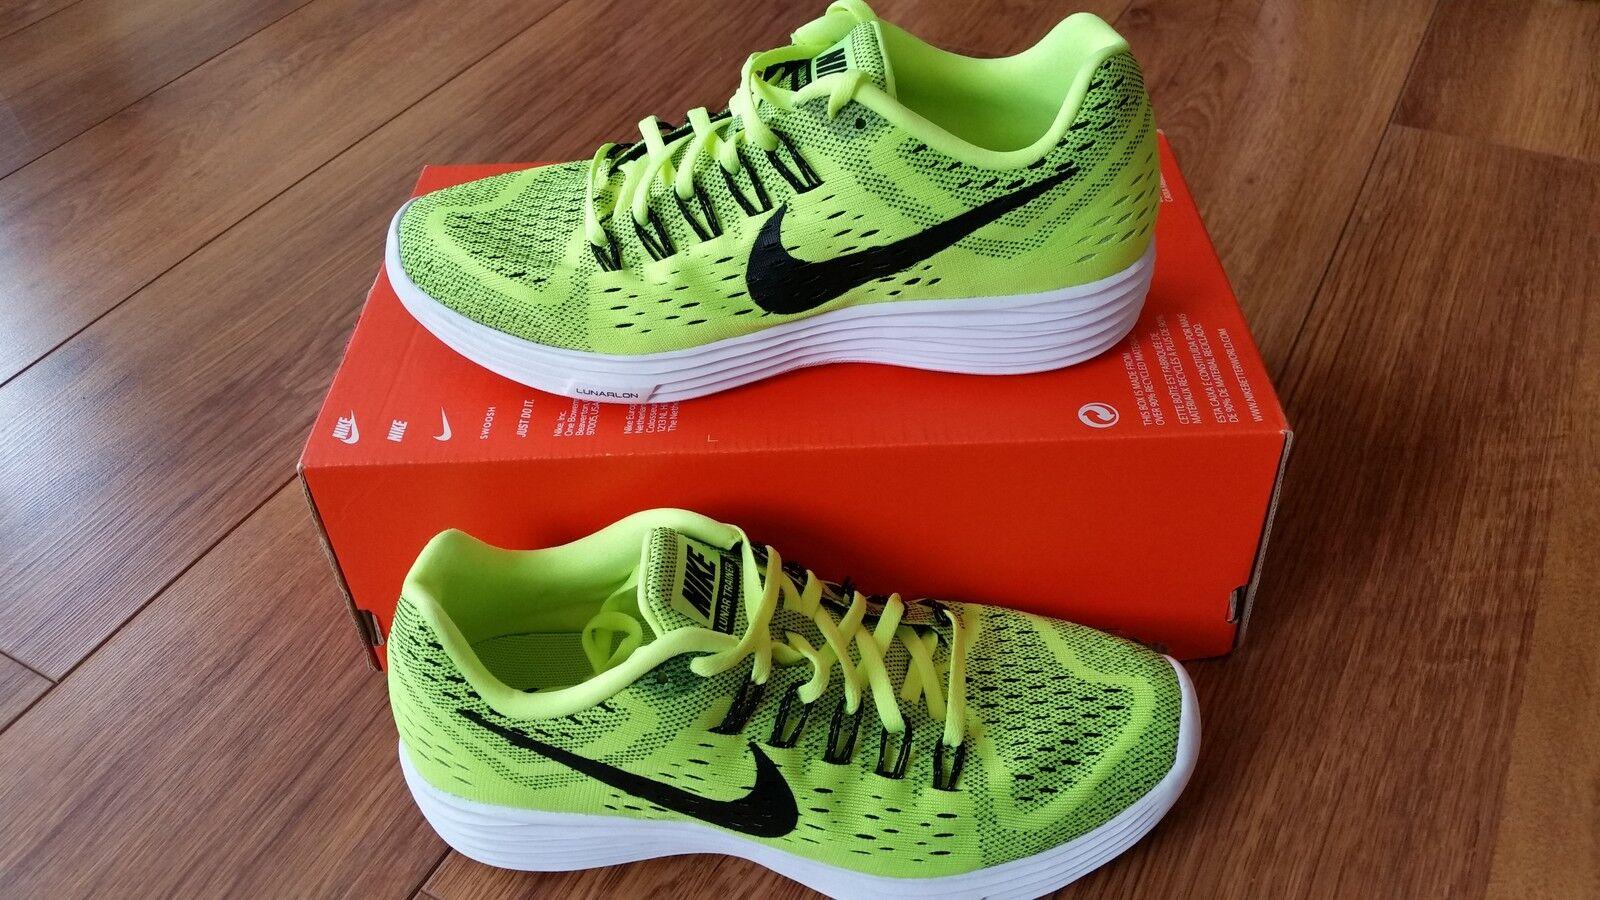 Da Uomo Nike Lunartempo Volt Nero Running Scarpe da ginnastica 705461 700